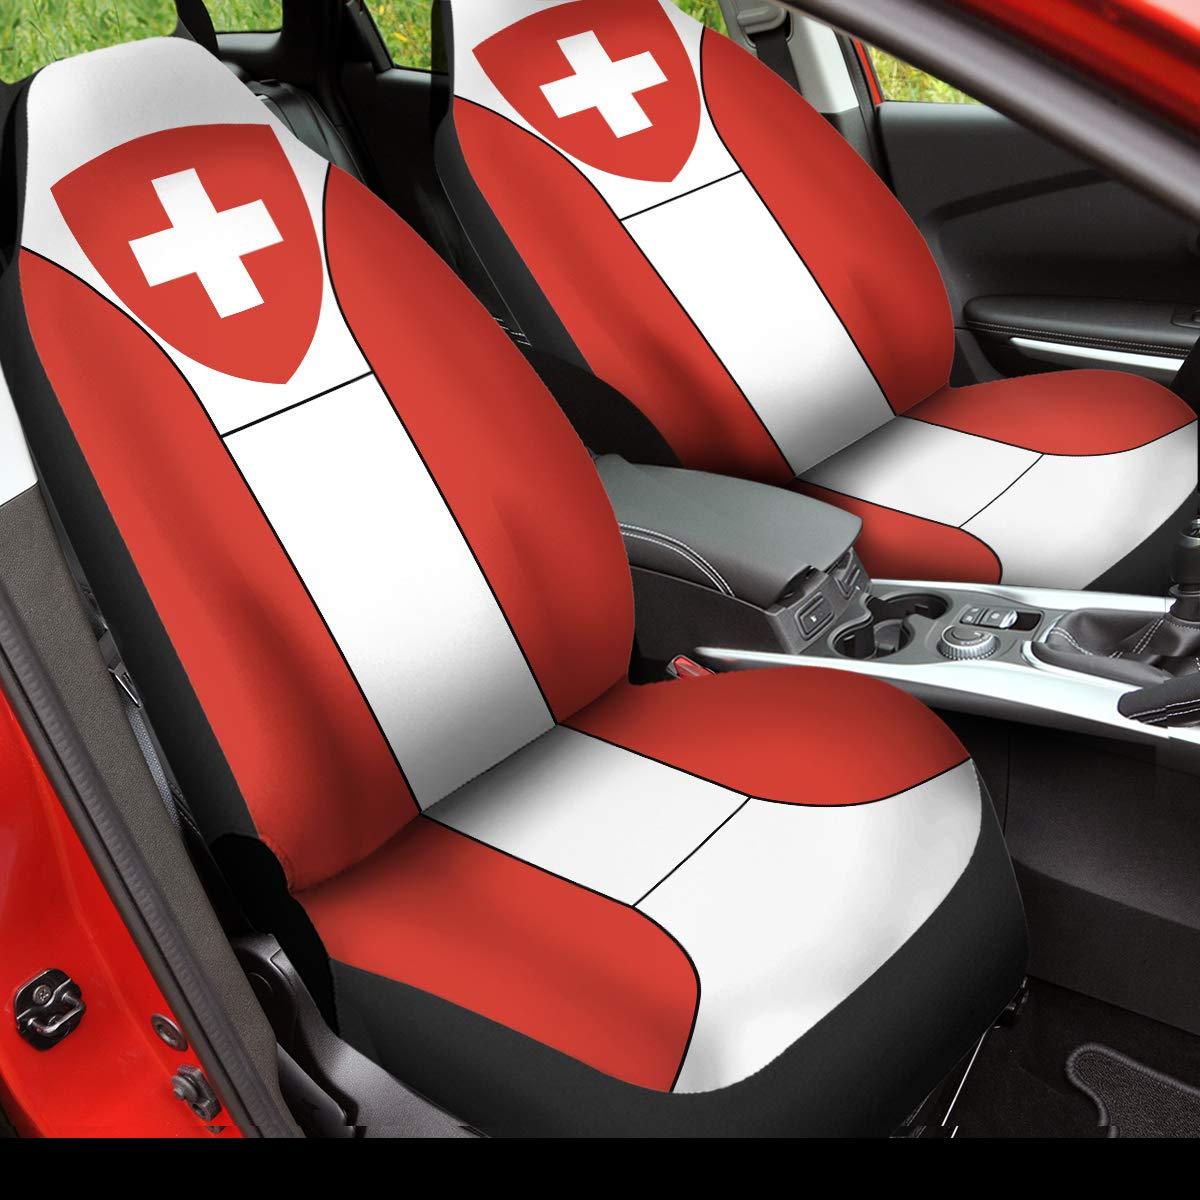 Amazon.com: VTH Global - Juego de fundas de asiento de coche ...